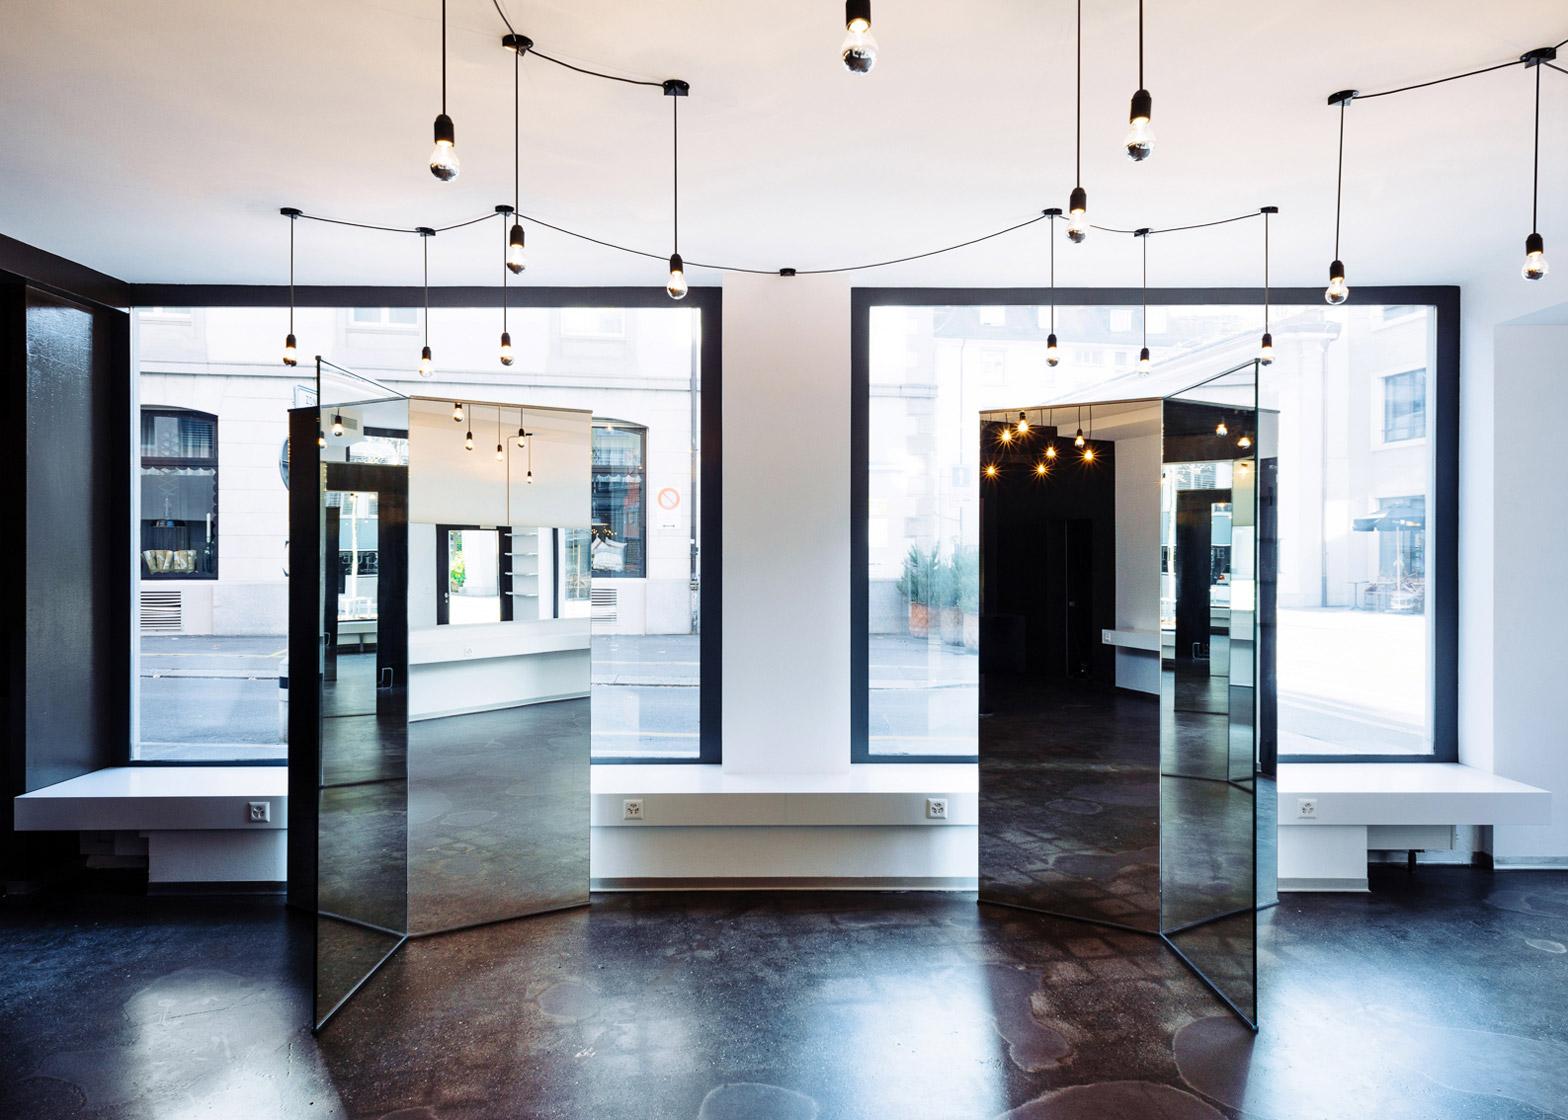 Barbershop Seefeldstrasse by Wülser Bechtel Architekten